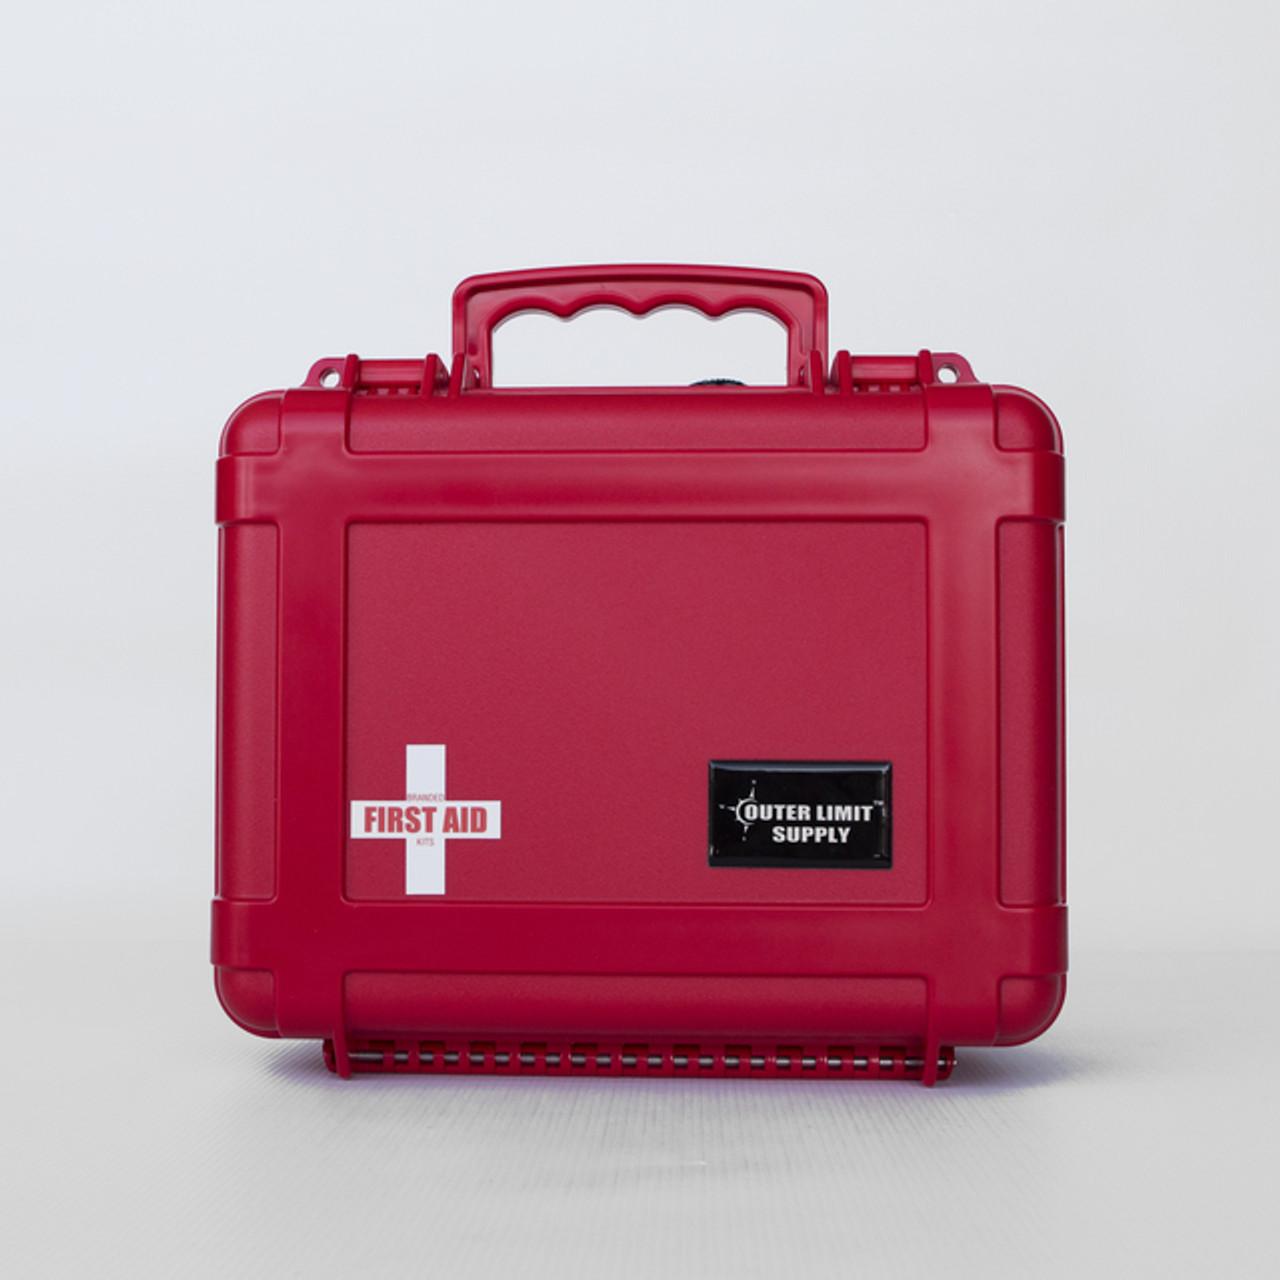 Waterproof First Aid Kits